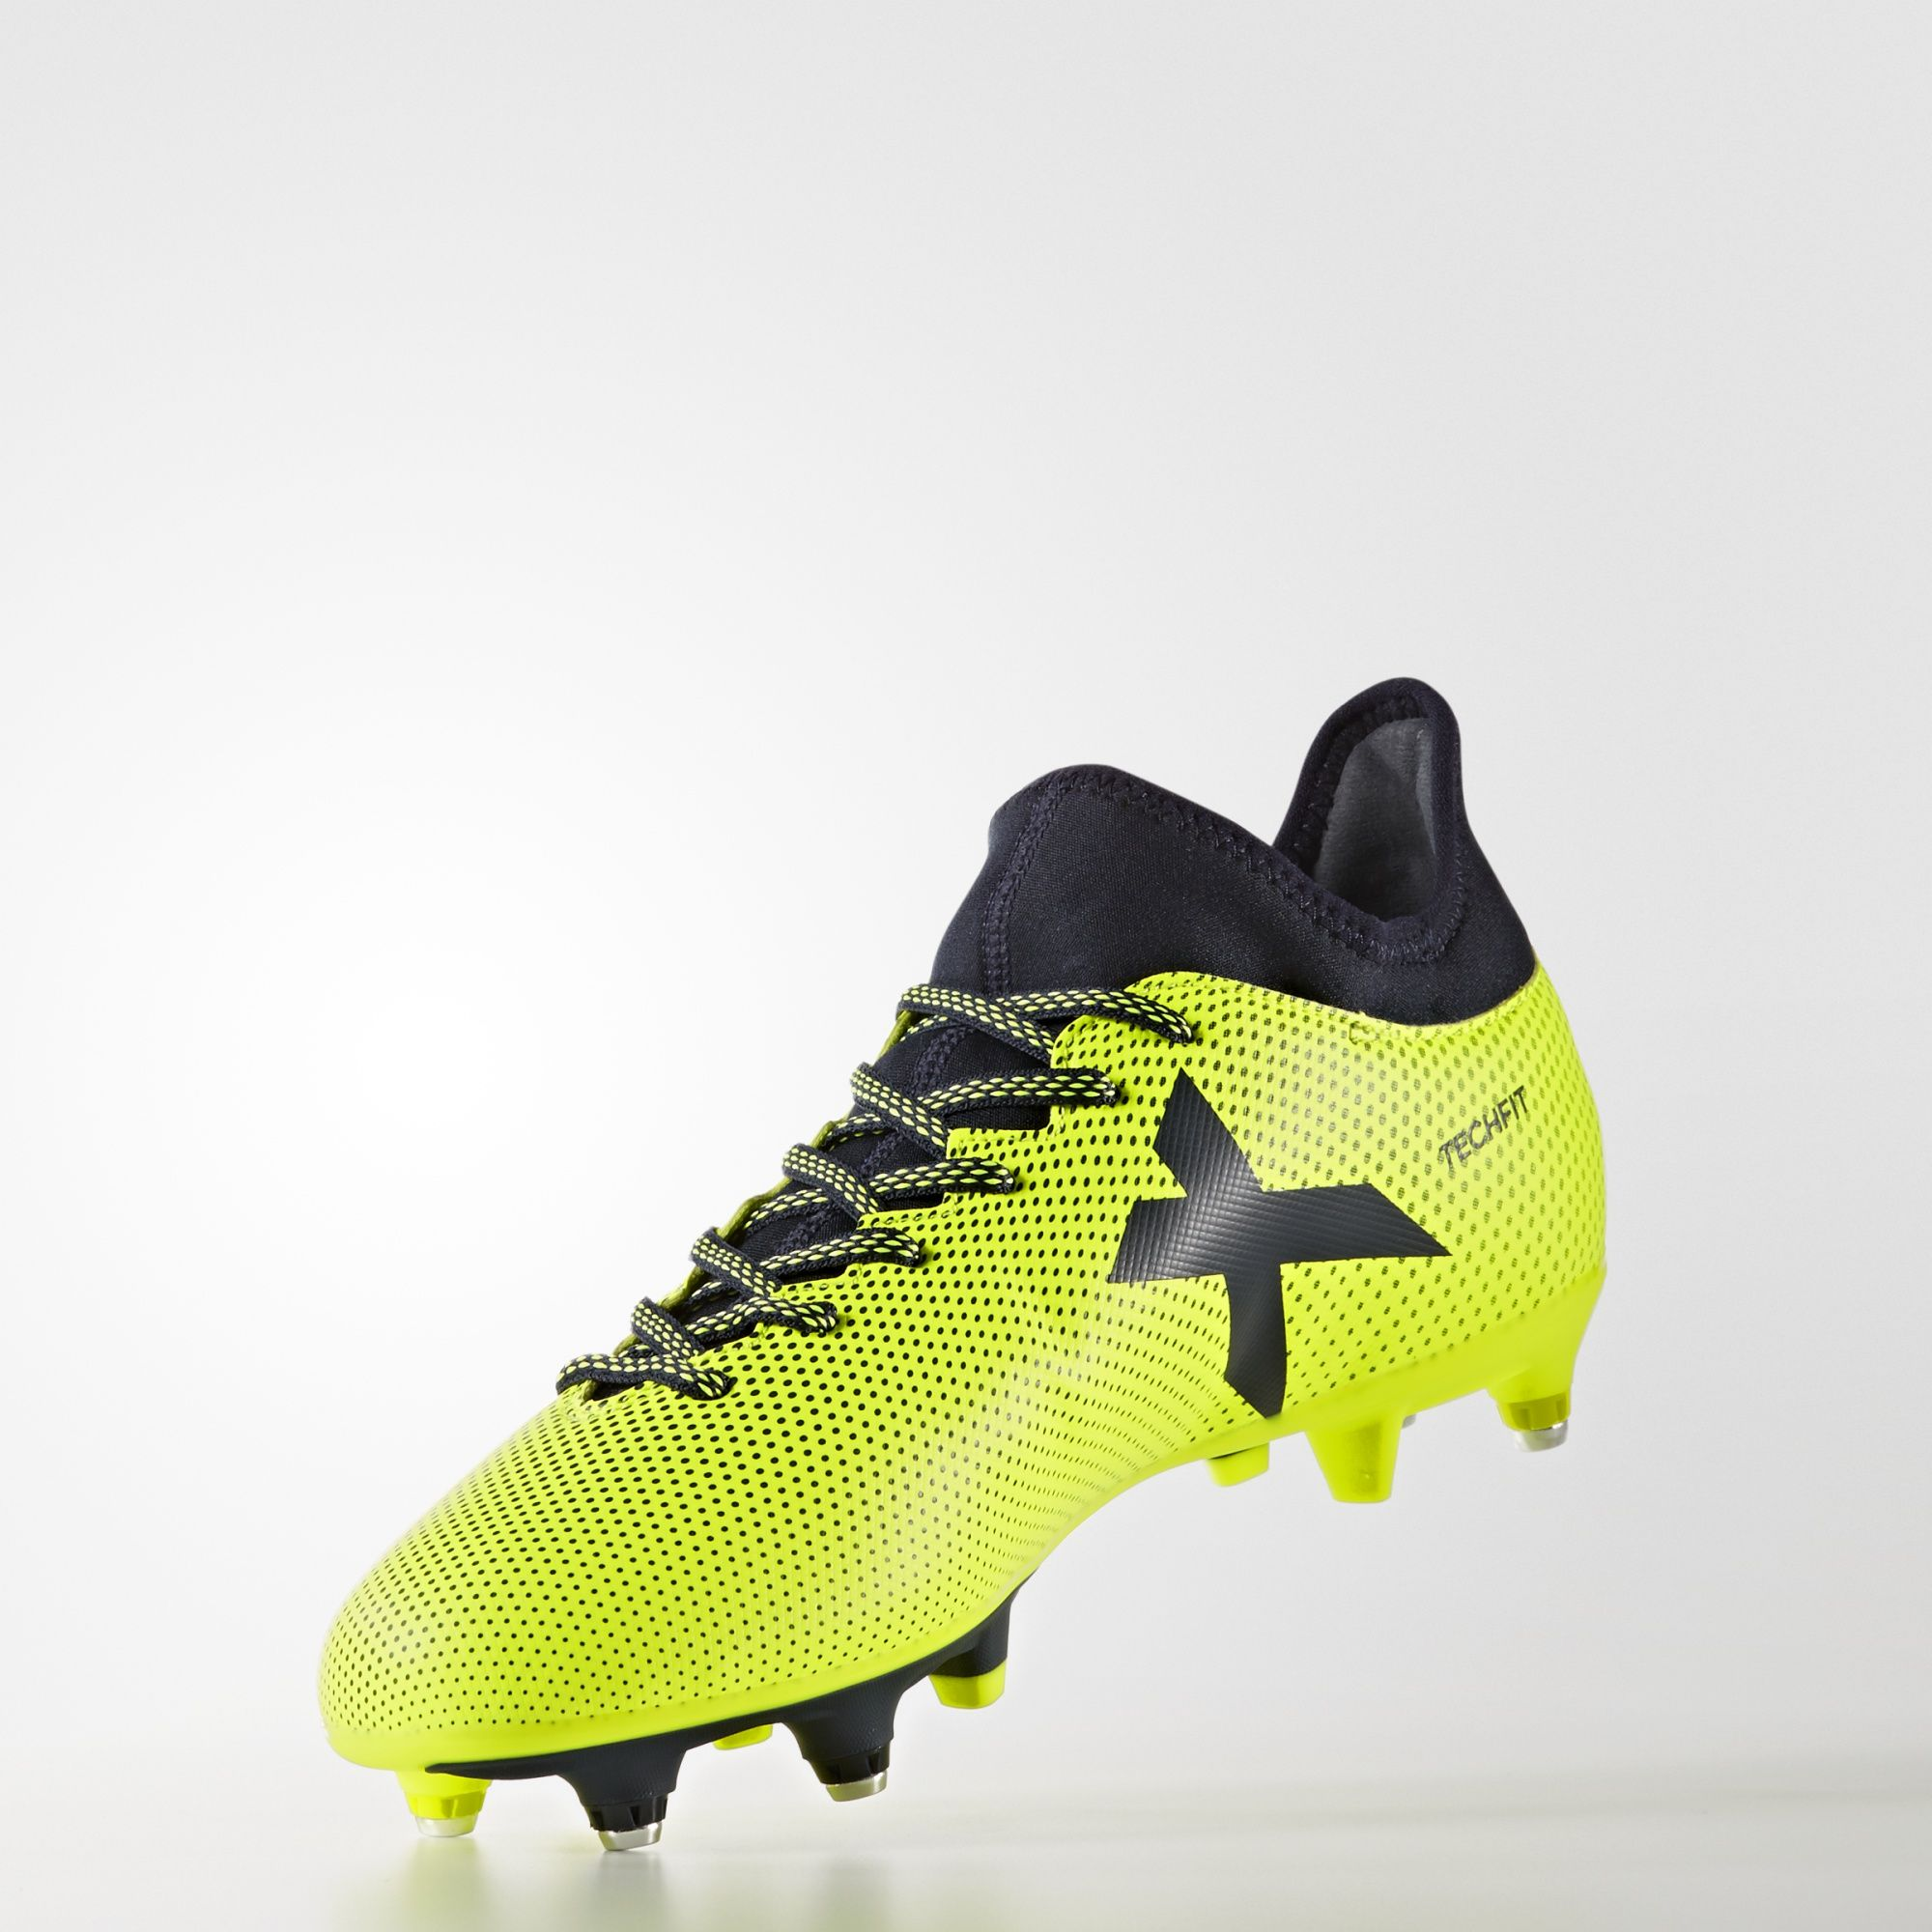 e41f1c1ee486 Adidas X 17.3 Soft Ground Boots